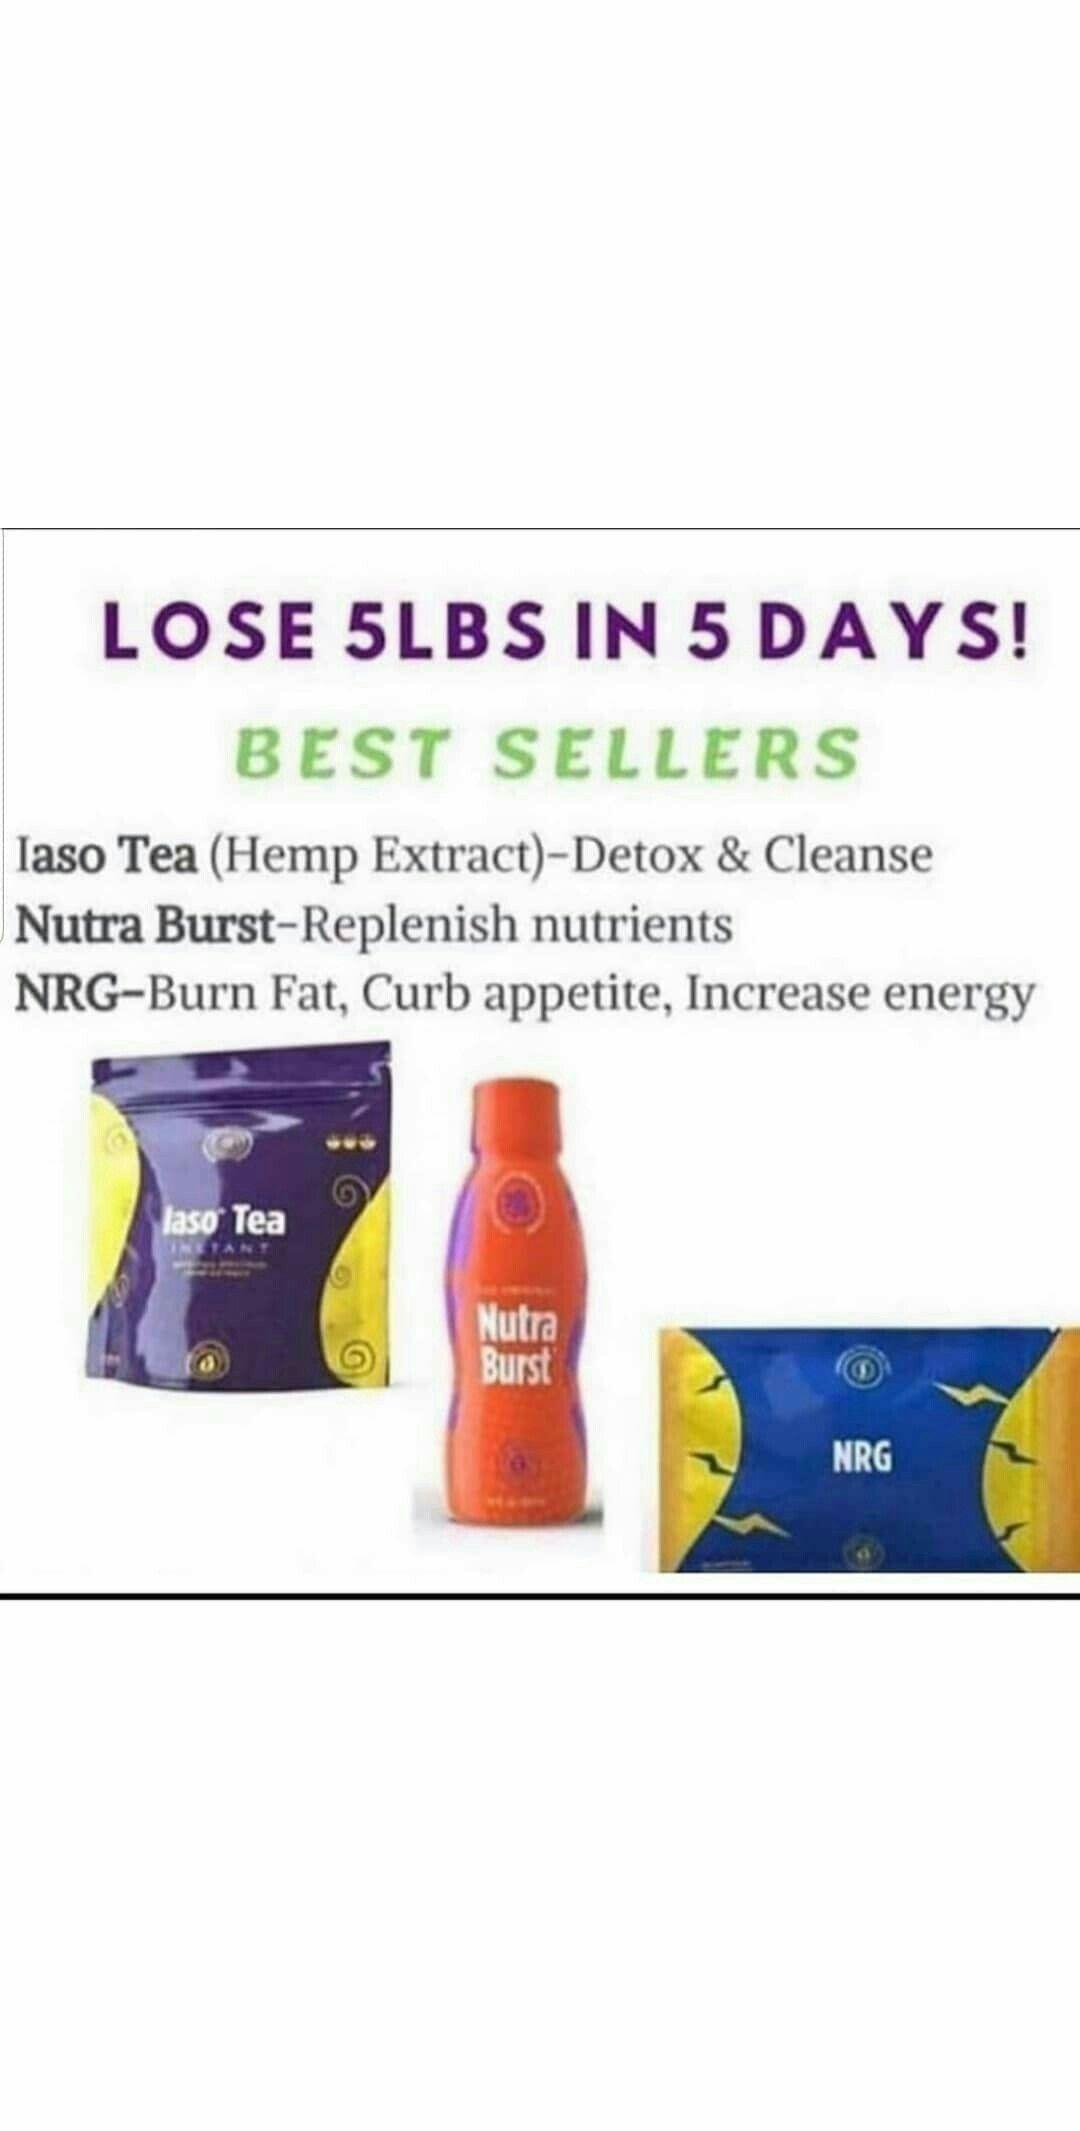 Nutraburst Iaso Tea Nrg In 2020 Iaso Tea How To Increase Energy Total Life Changes